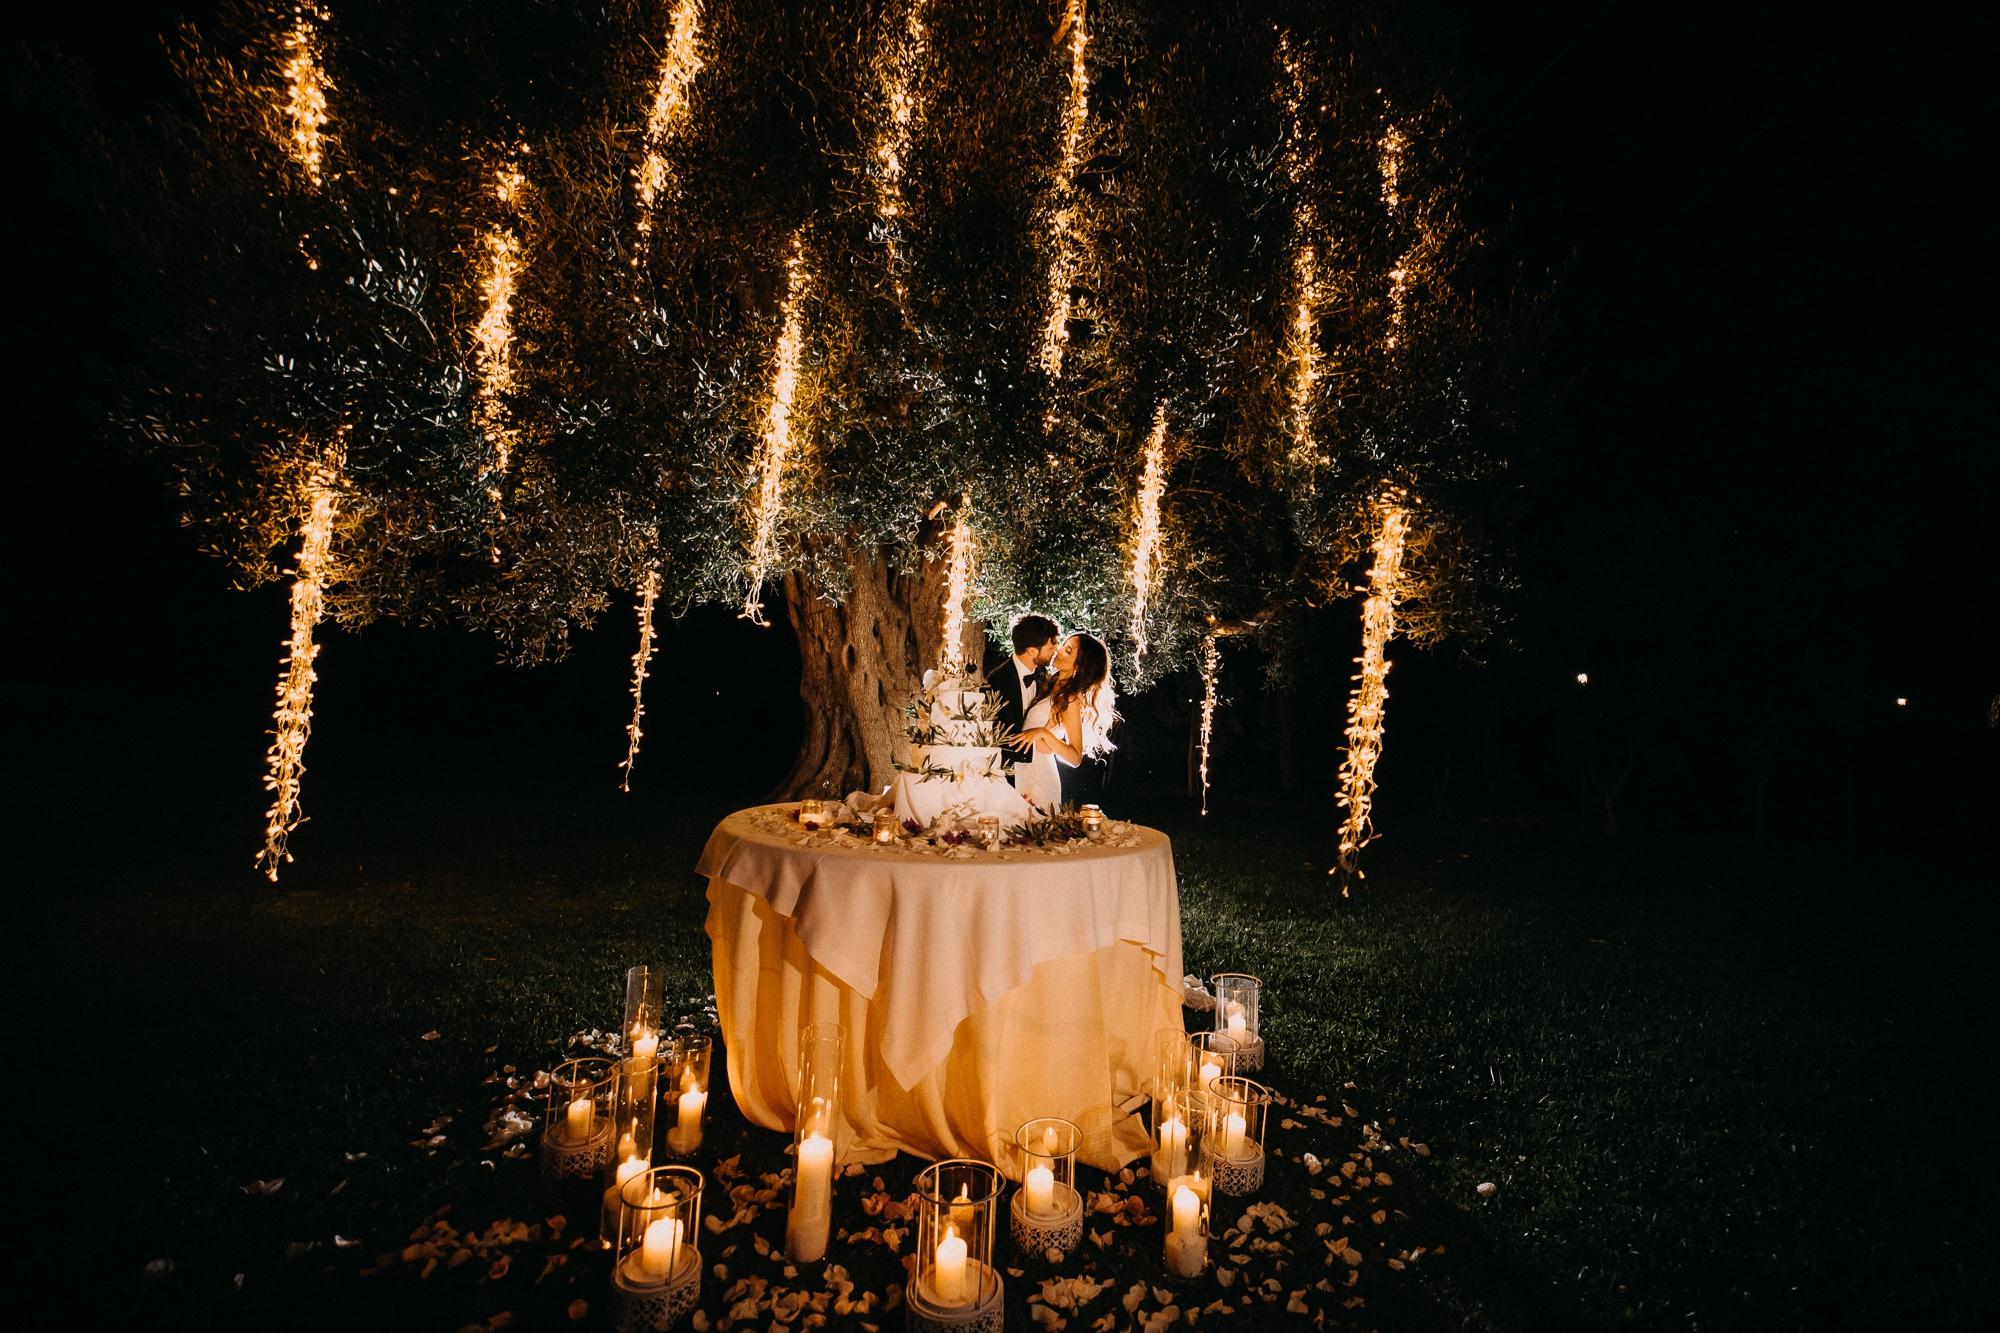 matrimonio ostuni fasano masseria salamina country vintage elegante fotografo artistico reportage massaro